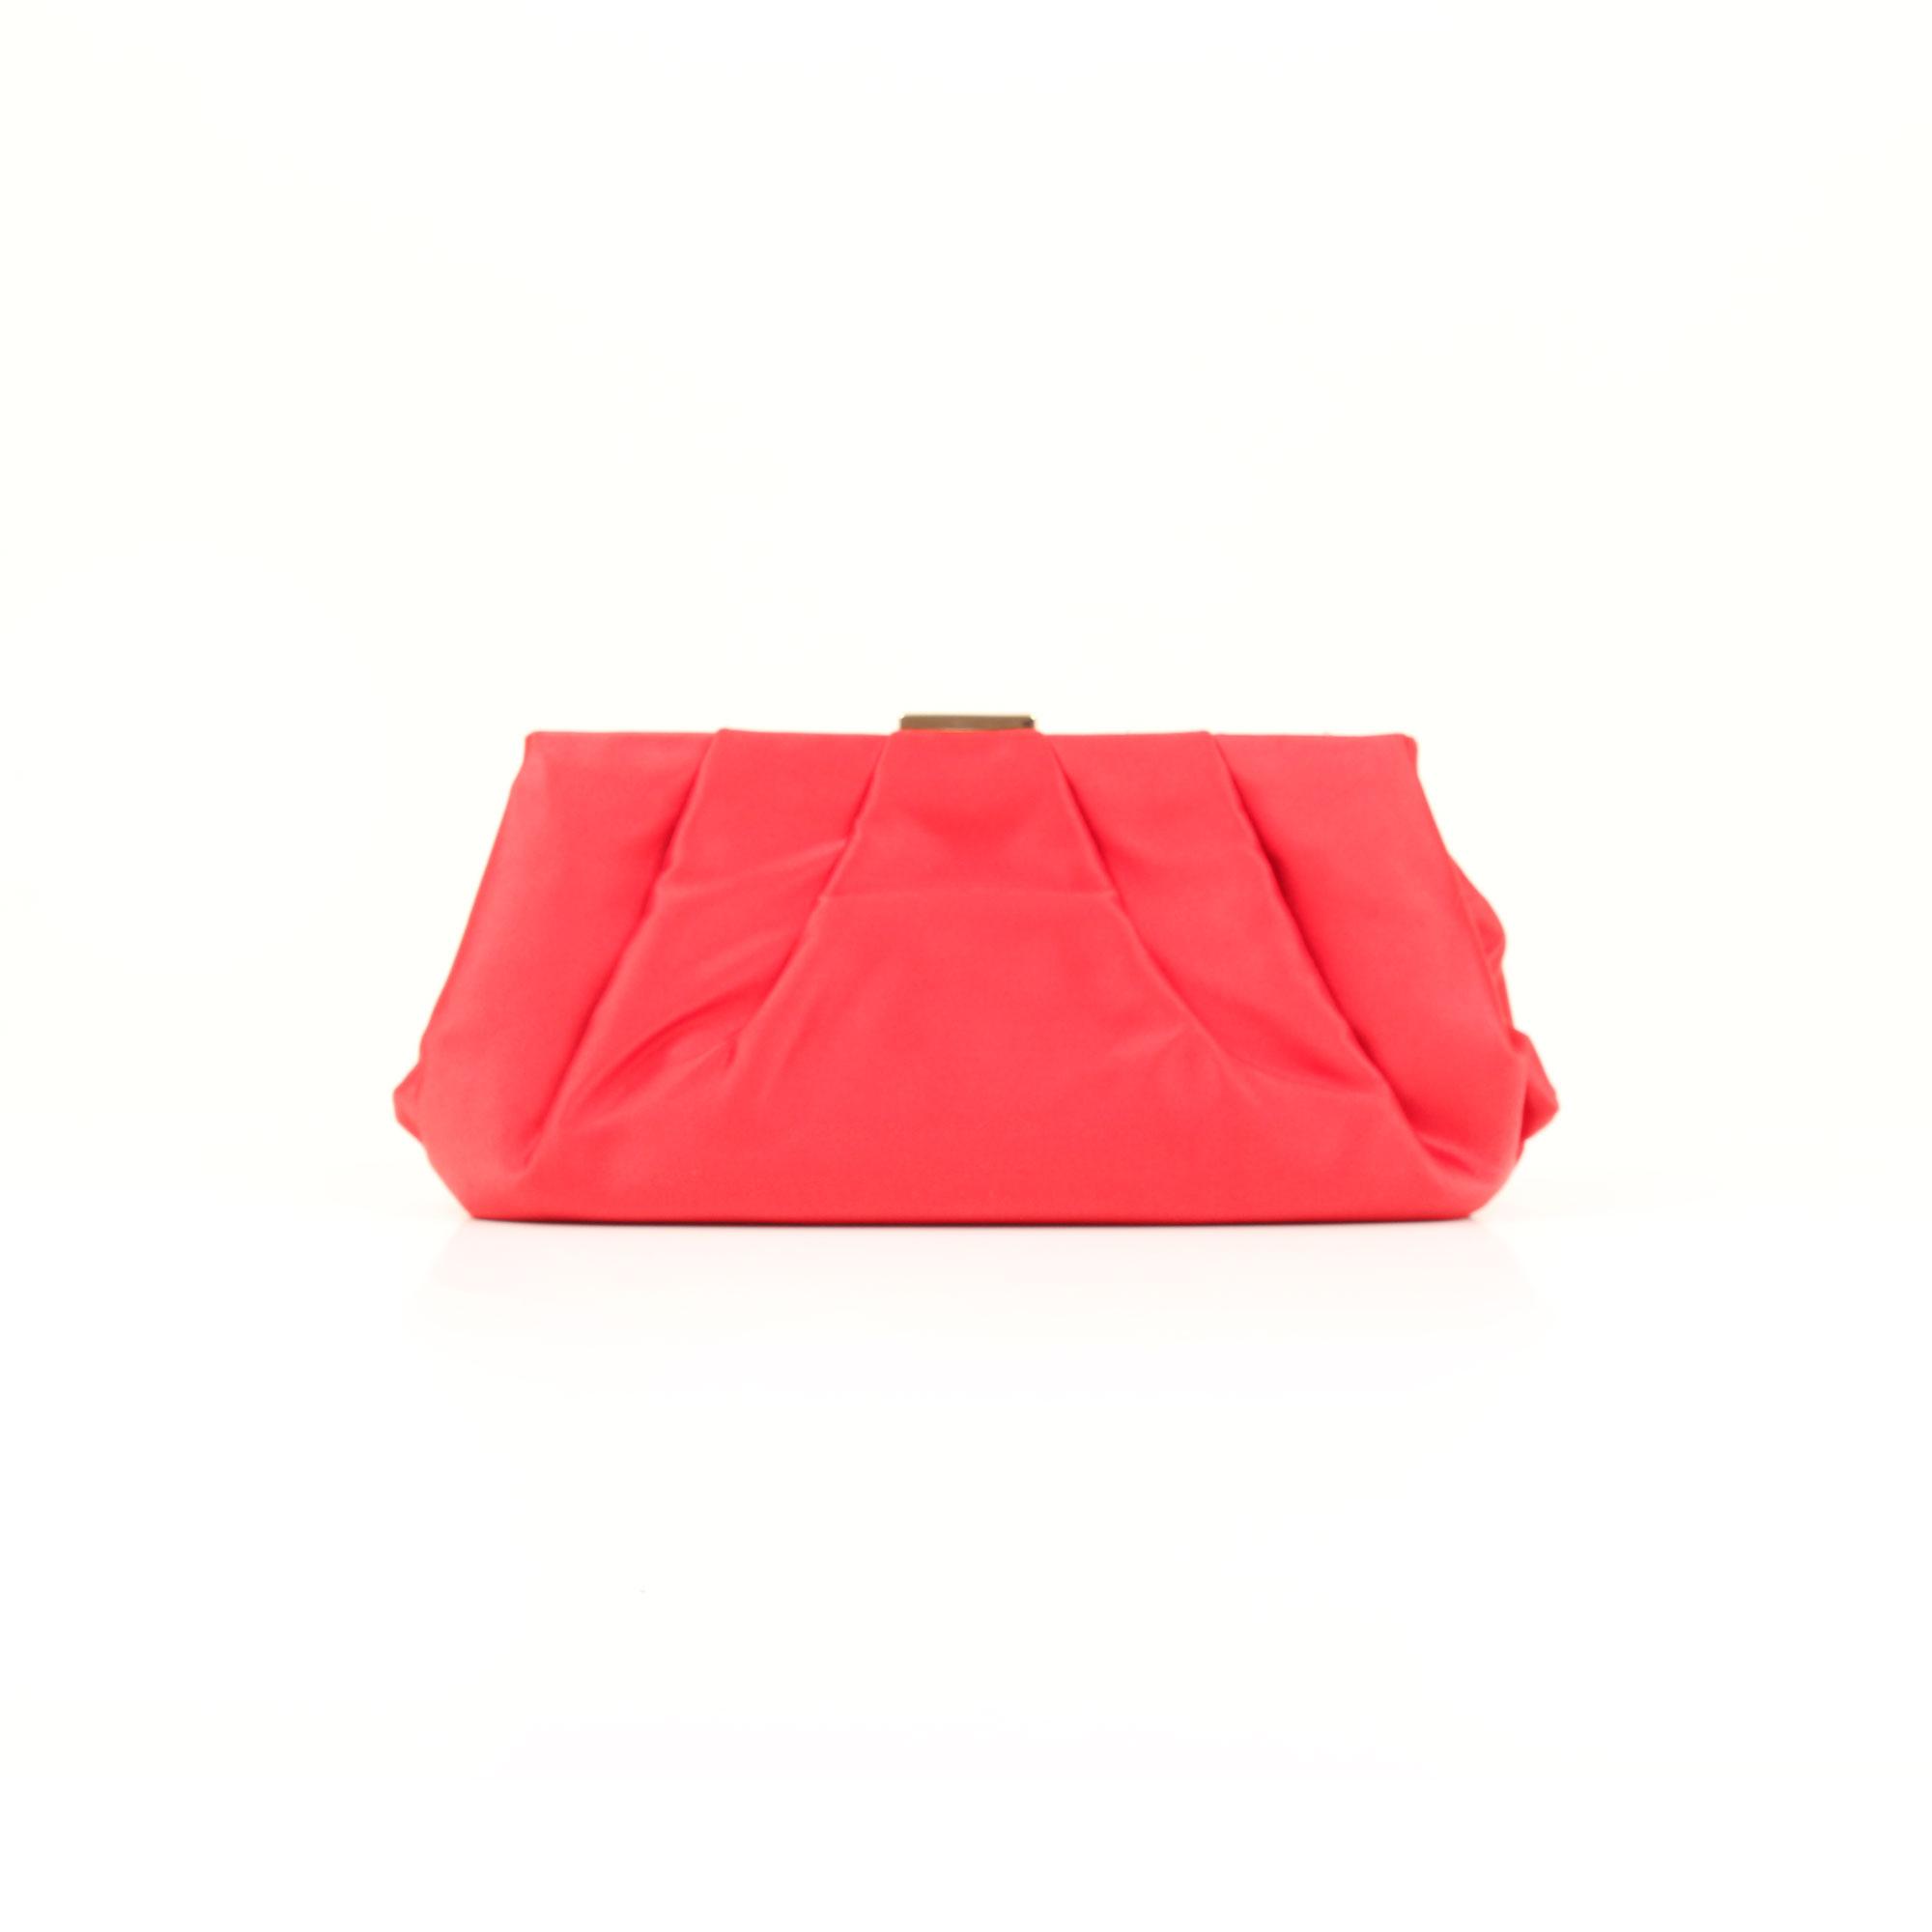 bolso-clutch-valentino-rojo-saten-trasera